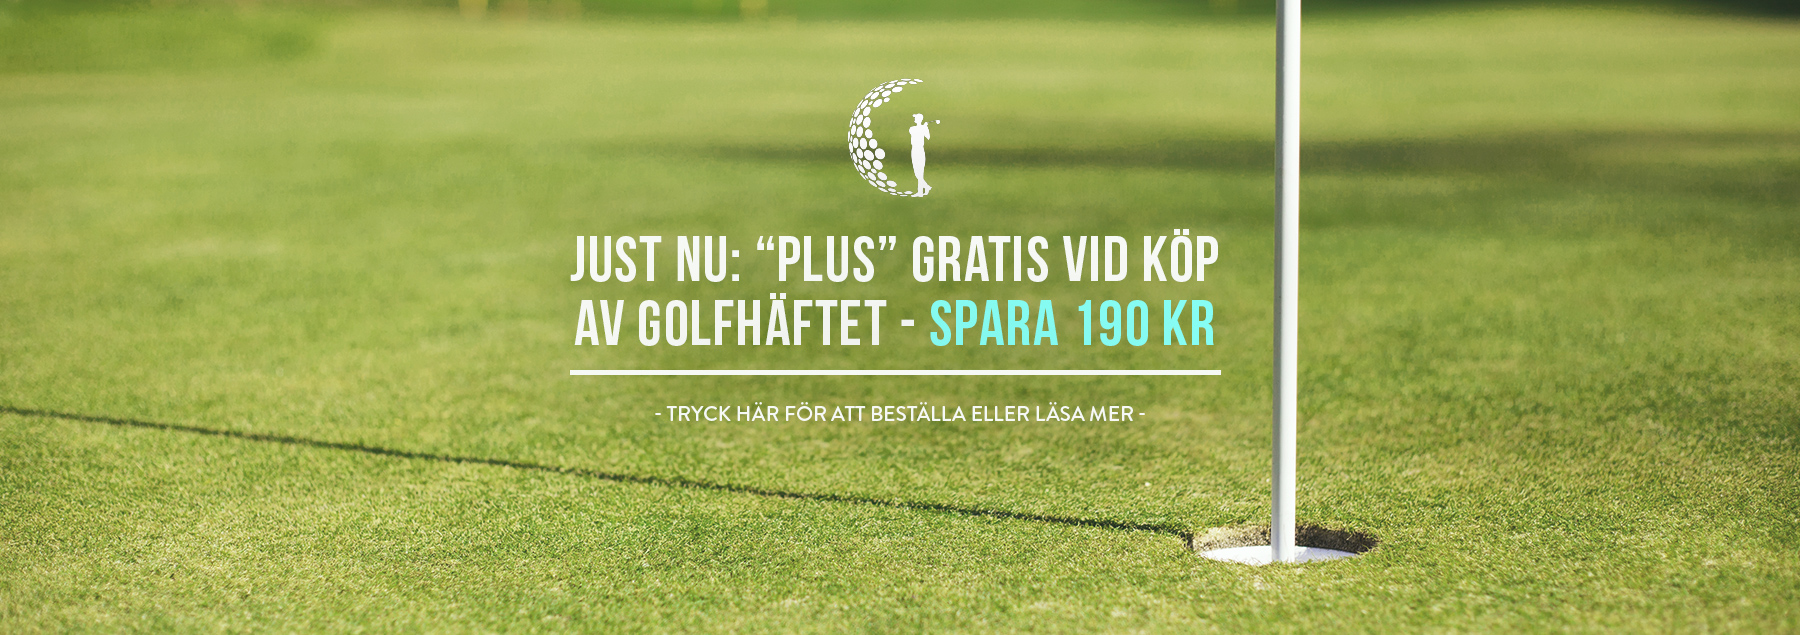 Golfhäftet Plus till riktigt bra pris!